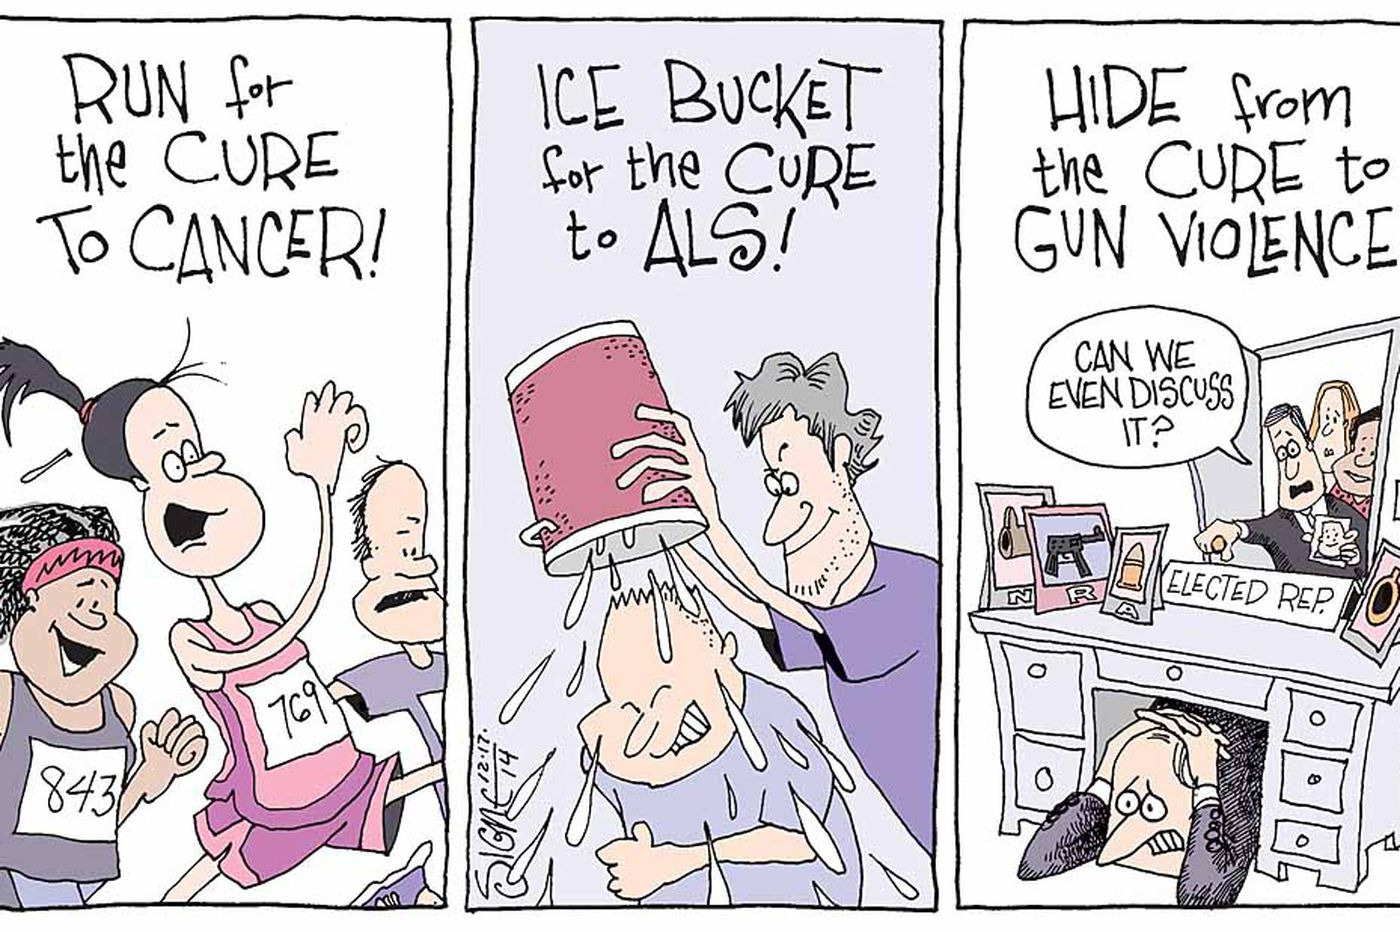 Daily Signe Cartoon 12/17/14